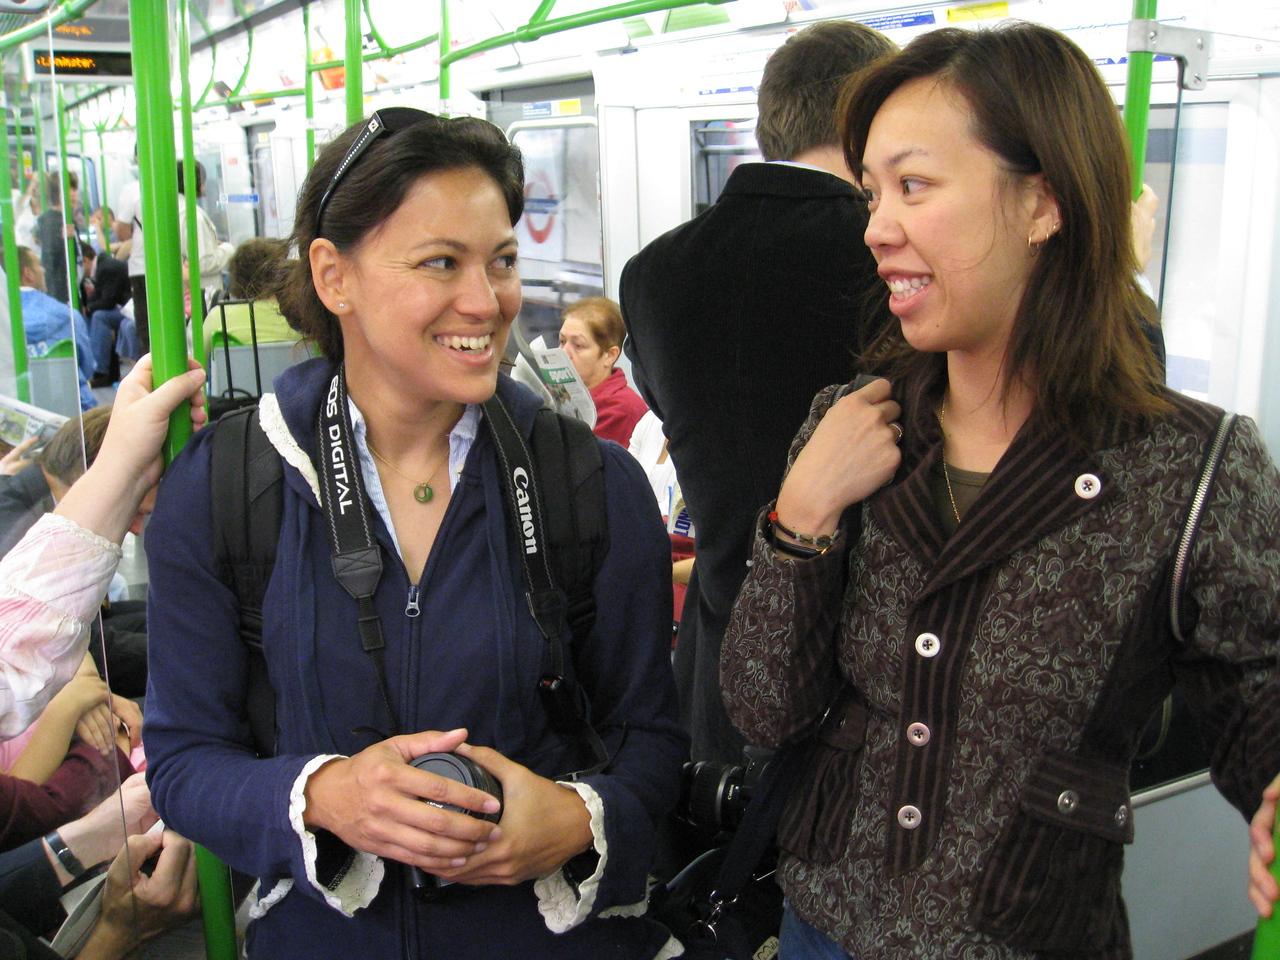 Jess and AJ, riding the tube.